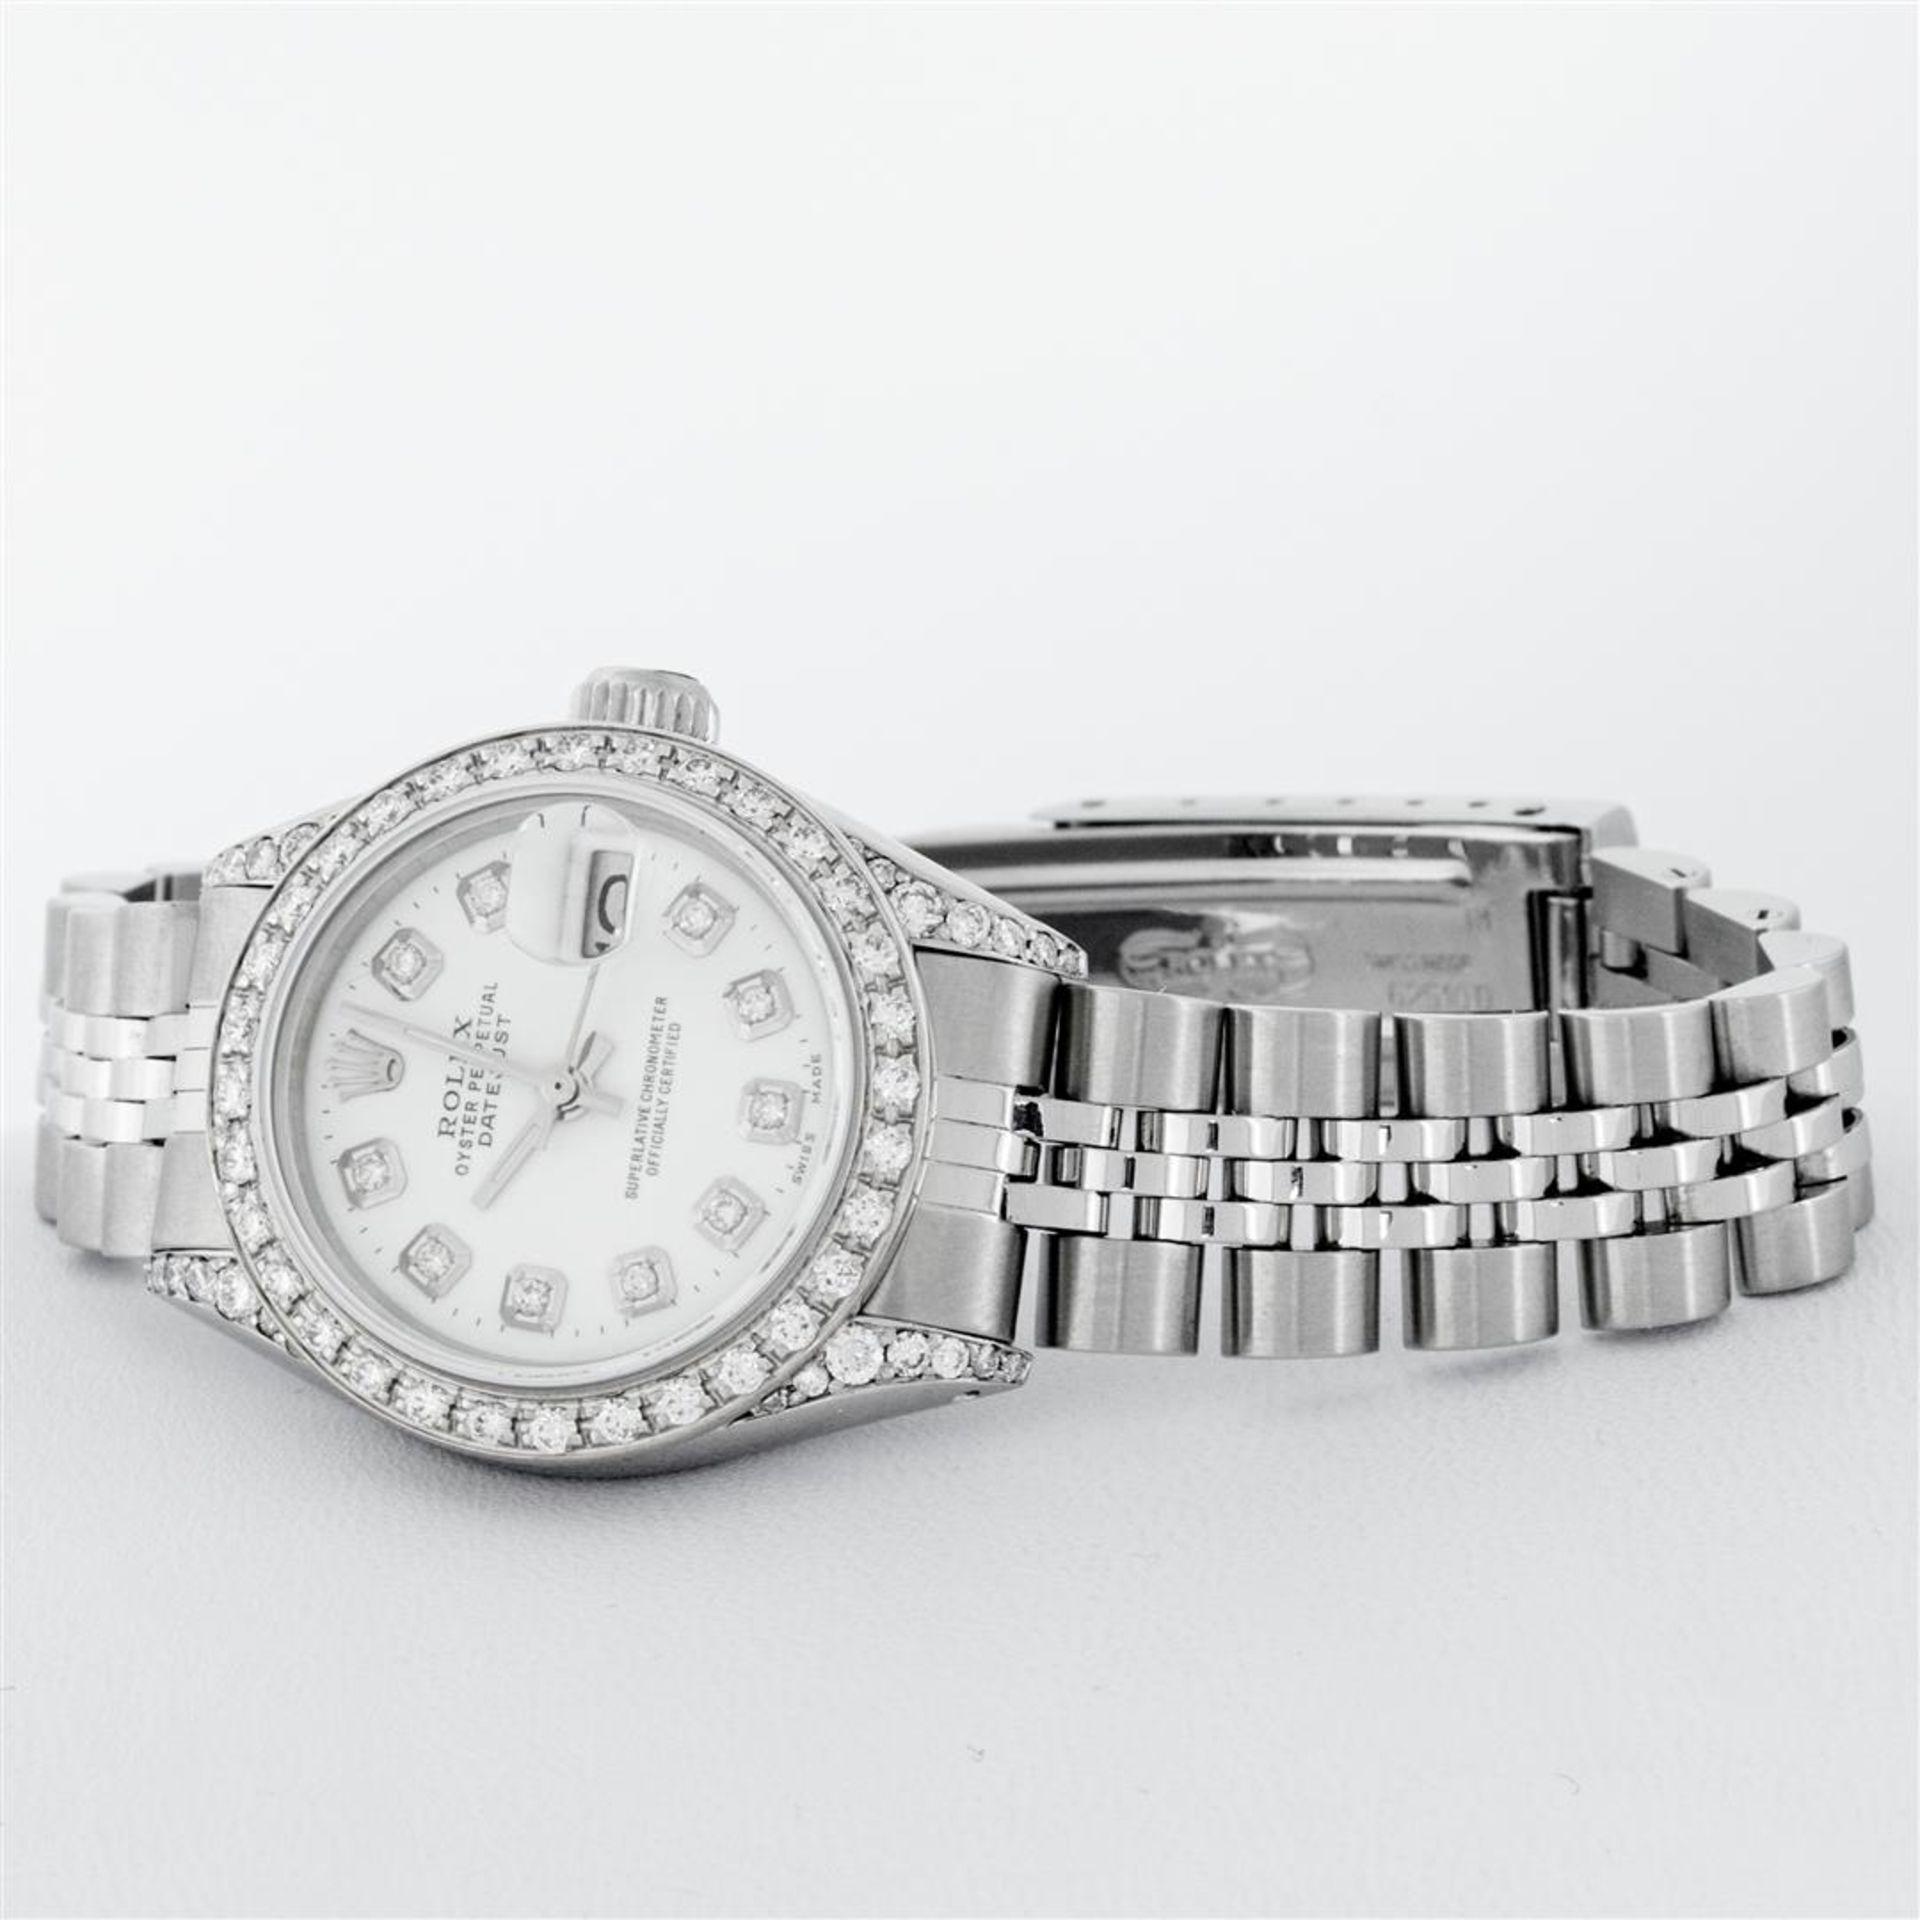 Rolex Ladies Stainless Steel White Diamond Lugs & Datejust Wristwatch - Image 4 of 9